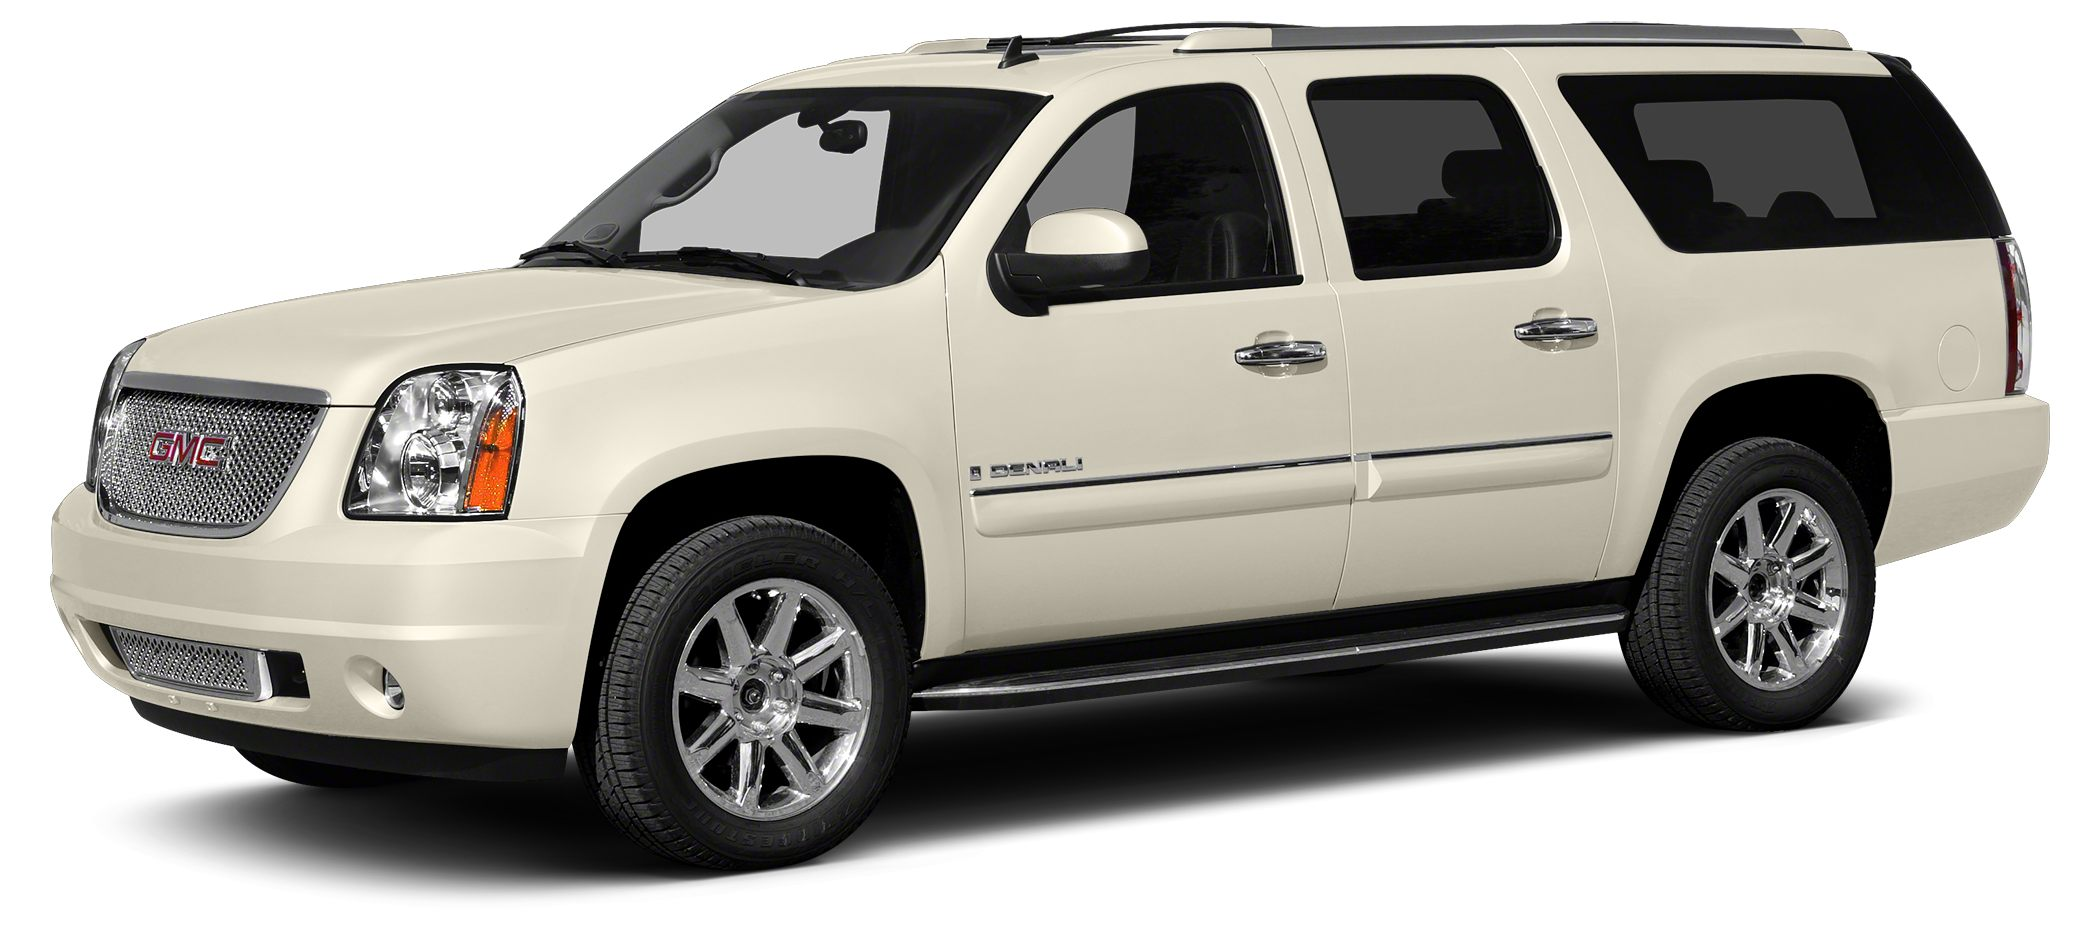 2014 GMC Yukon XL 1500 Denali ASK FOR FRANK JERAMYOR KRAIG  WE DELIVER ANYWHERE  4WD Bluetoo